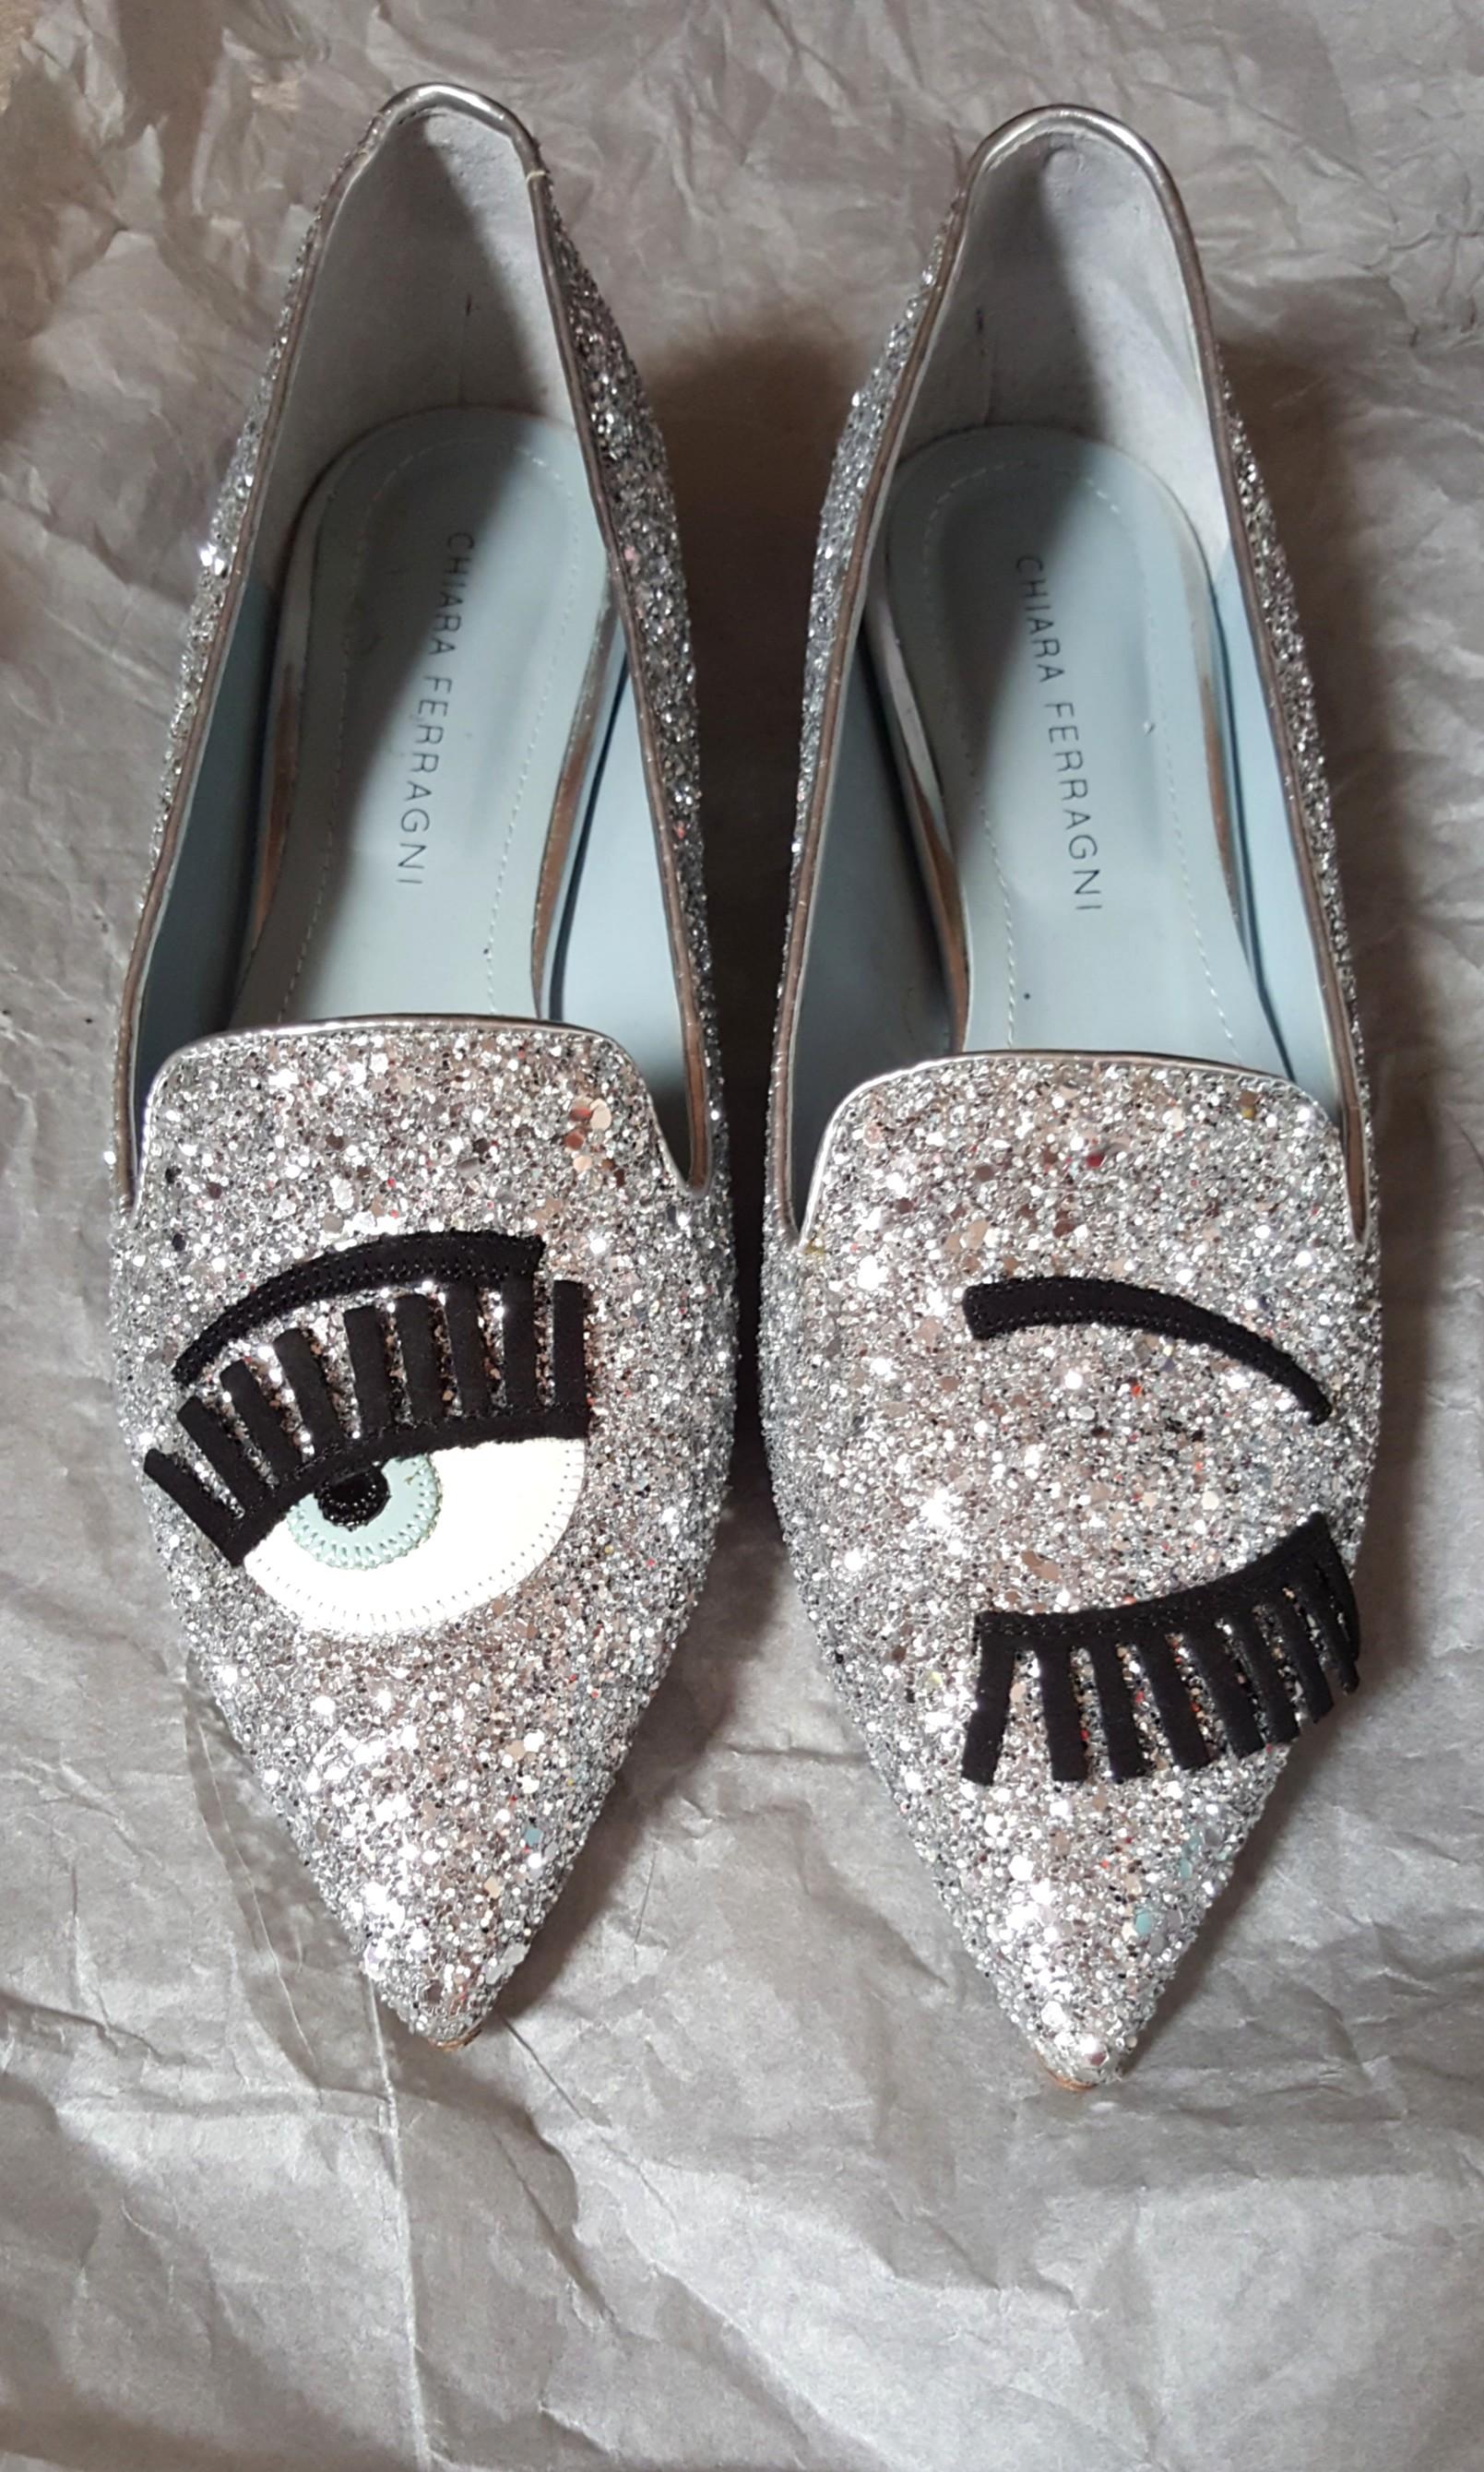 be7130fba Chiara Ferragni Flirting Glitter Shoes, Luxury, Shoes on Carousell